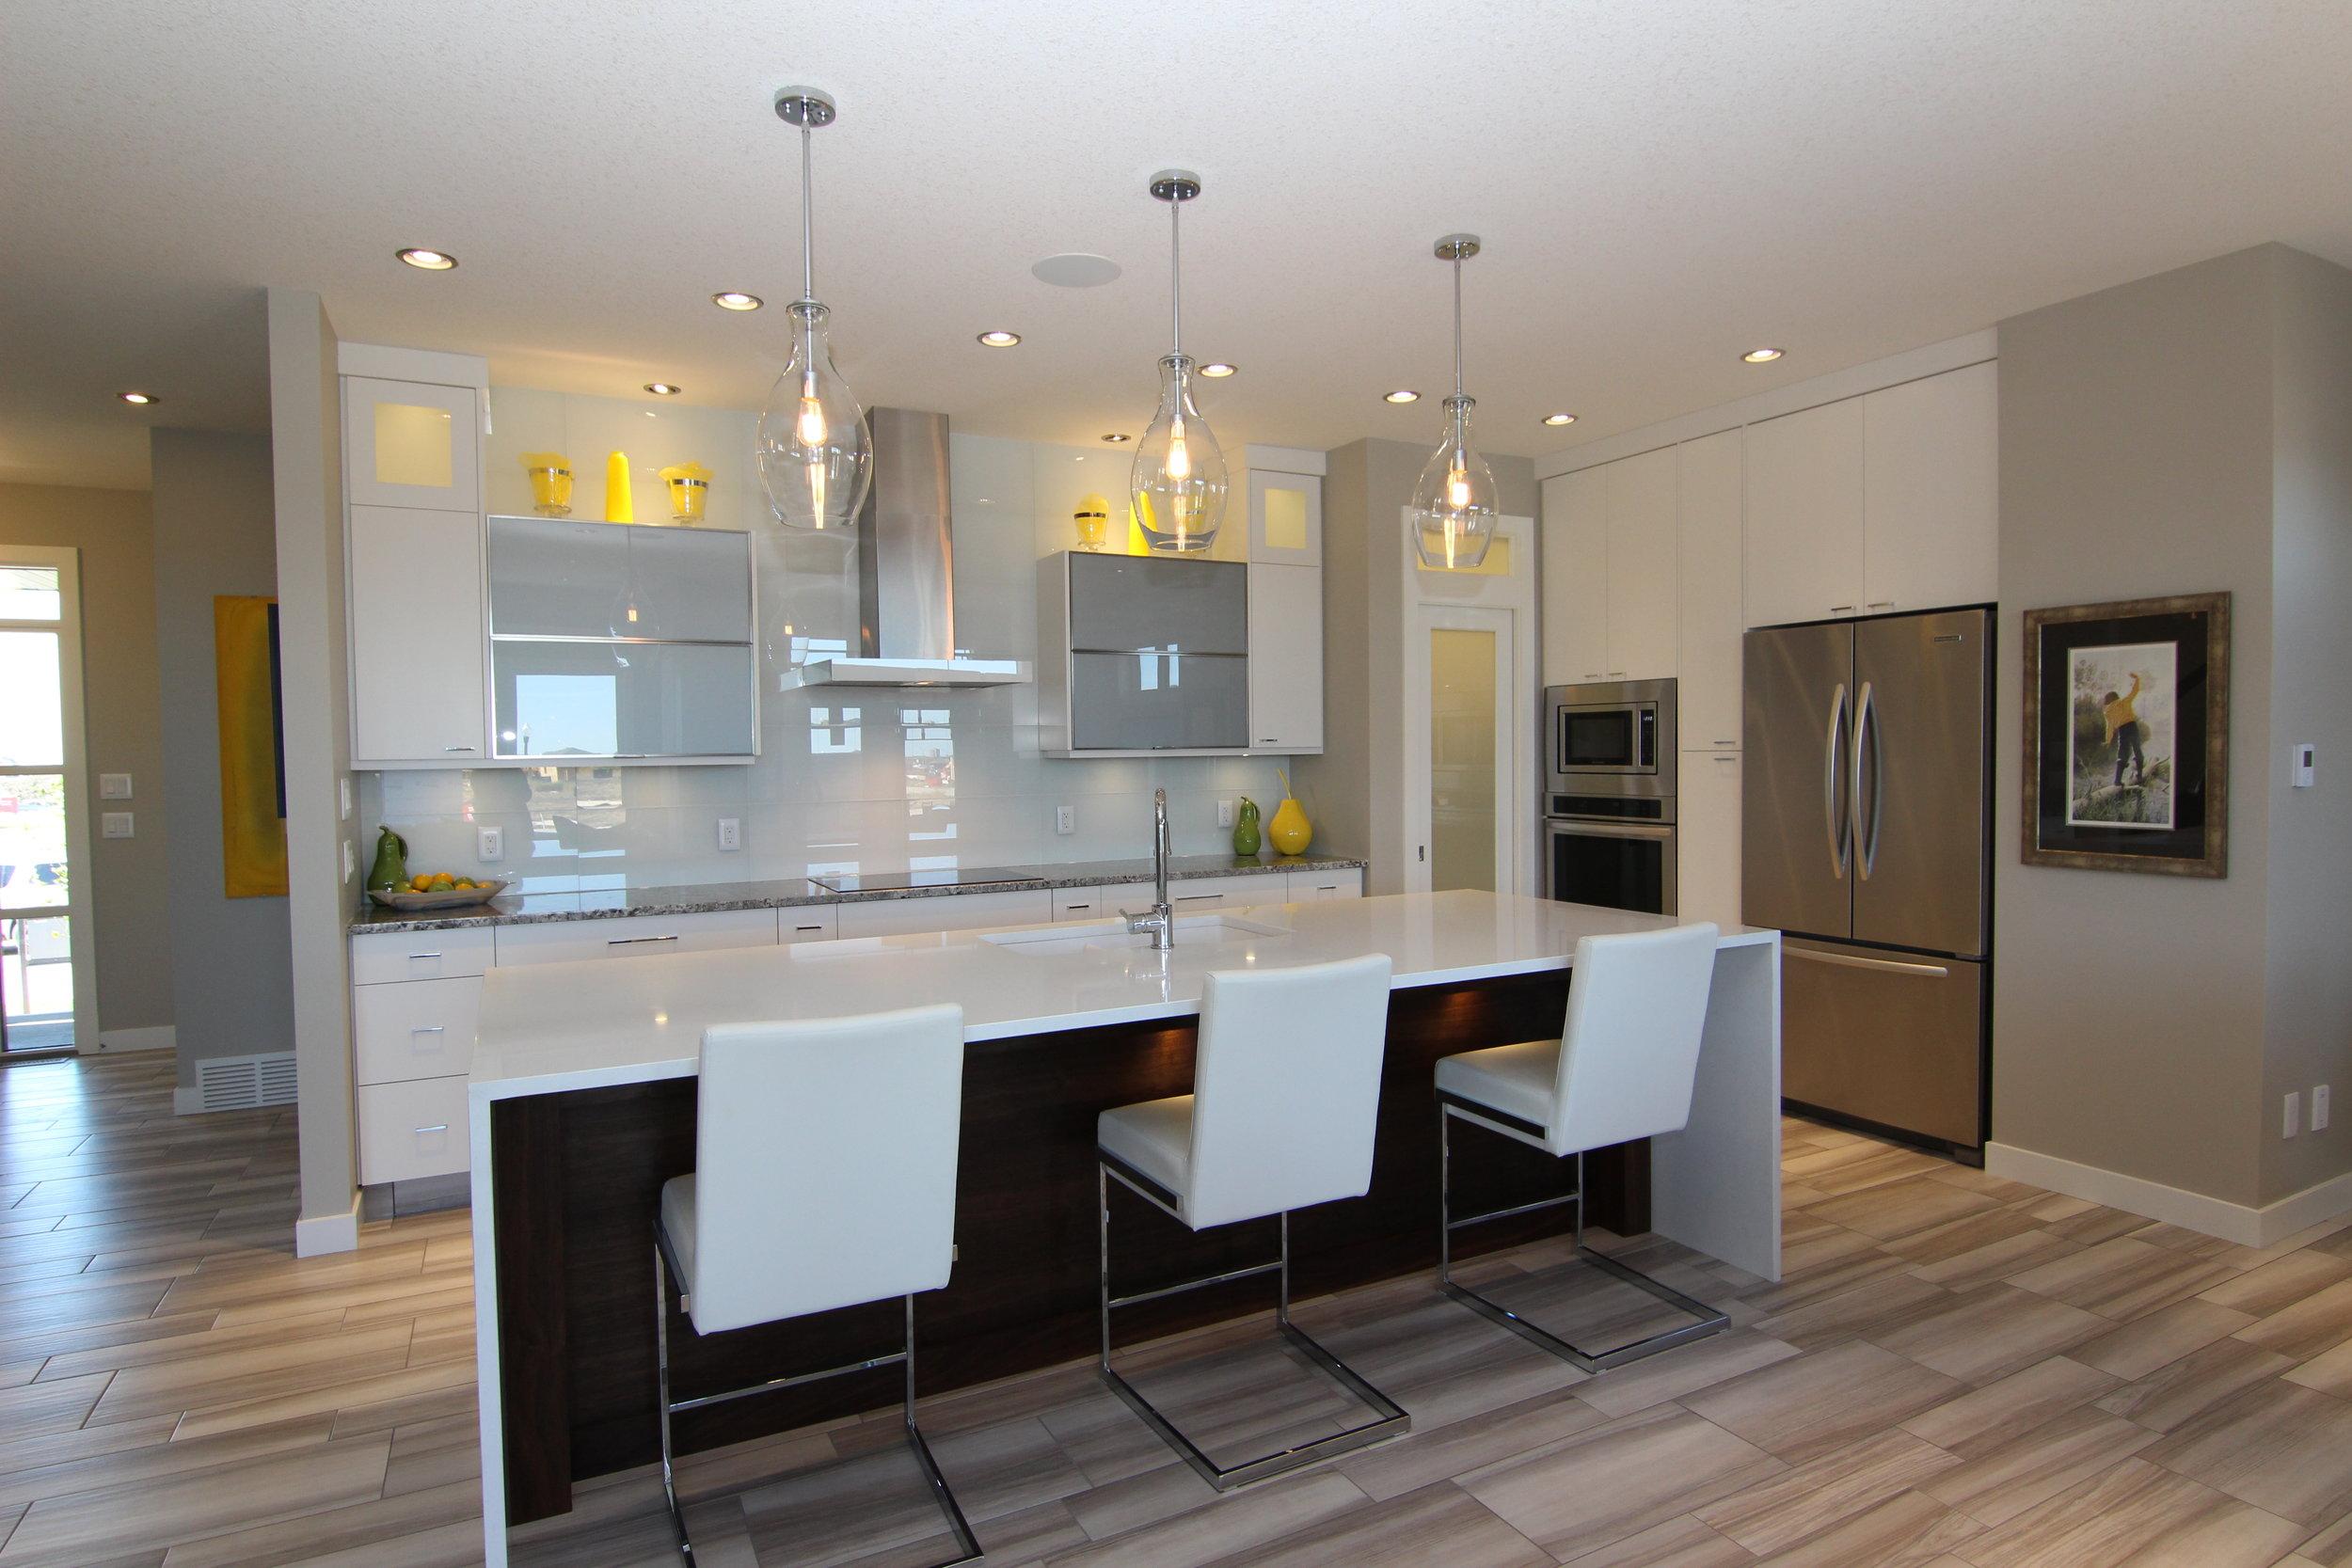 5286 Aviator Crescent (10) - Kitchen.JPG